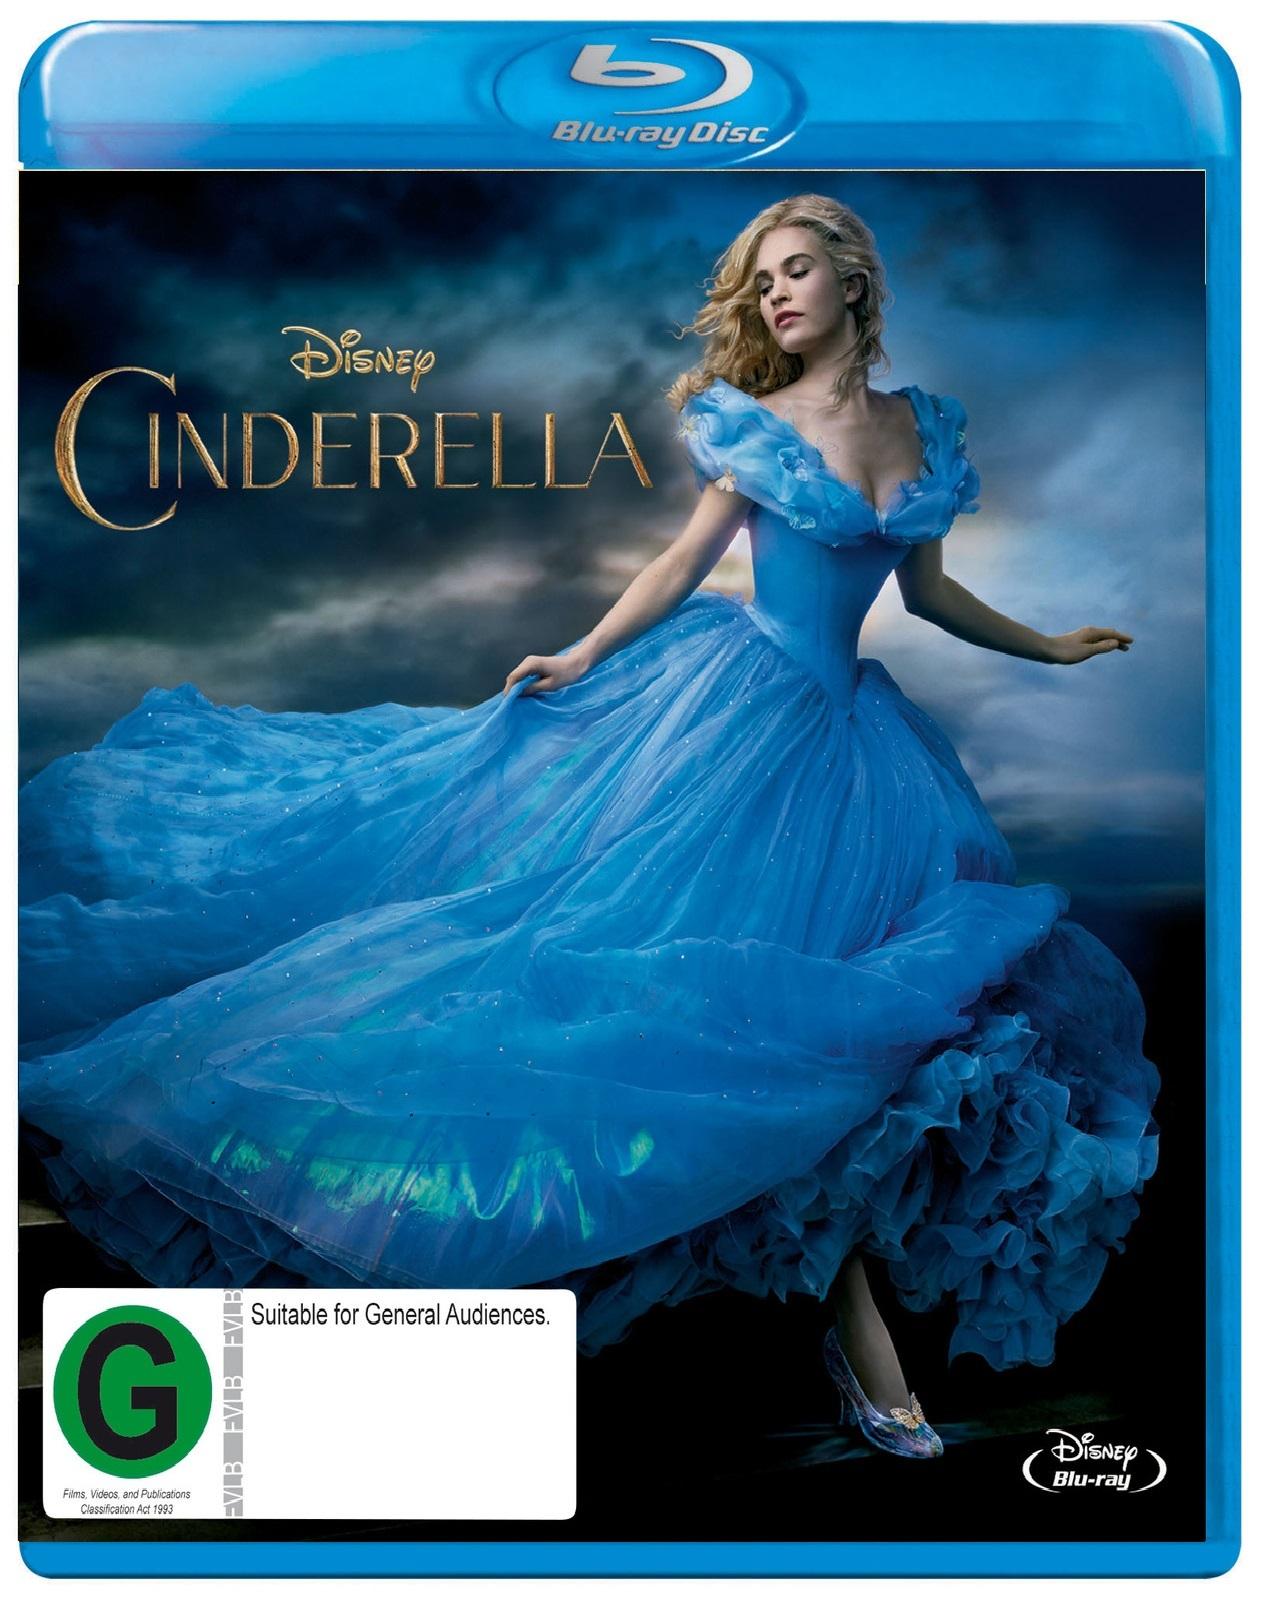 Cinderella (2015) on Blu-ray image